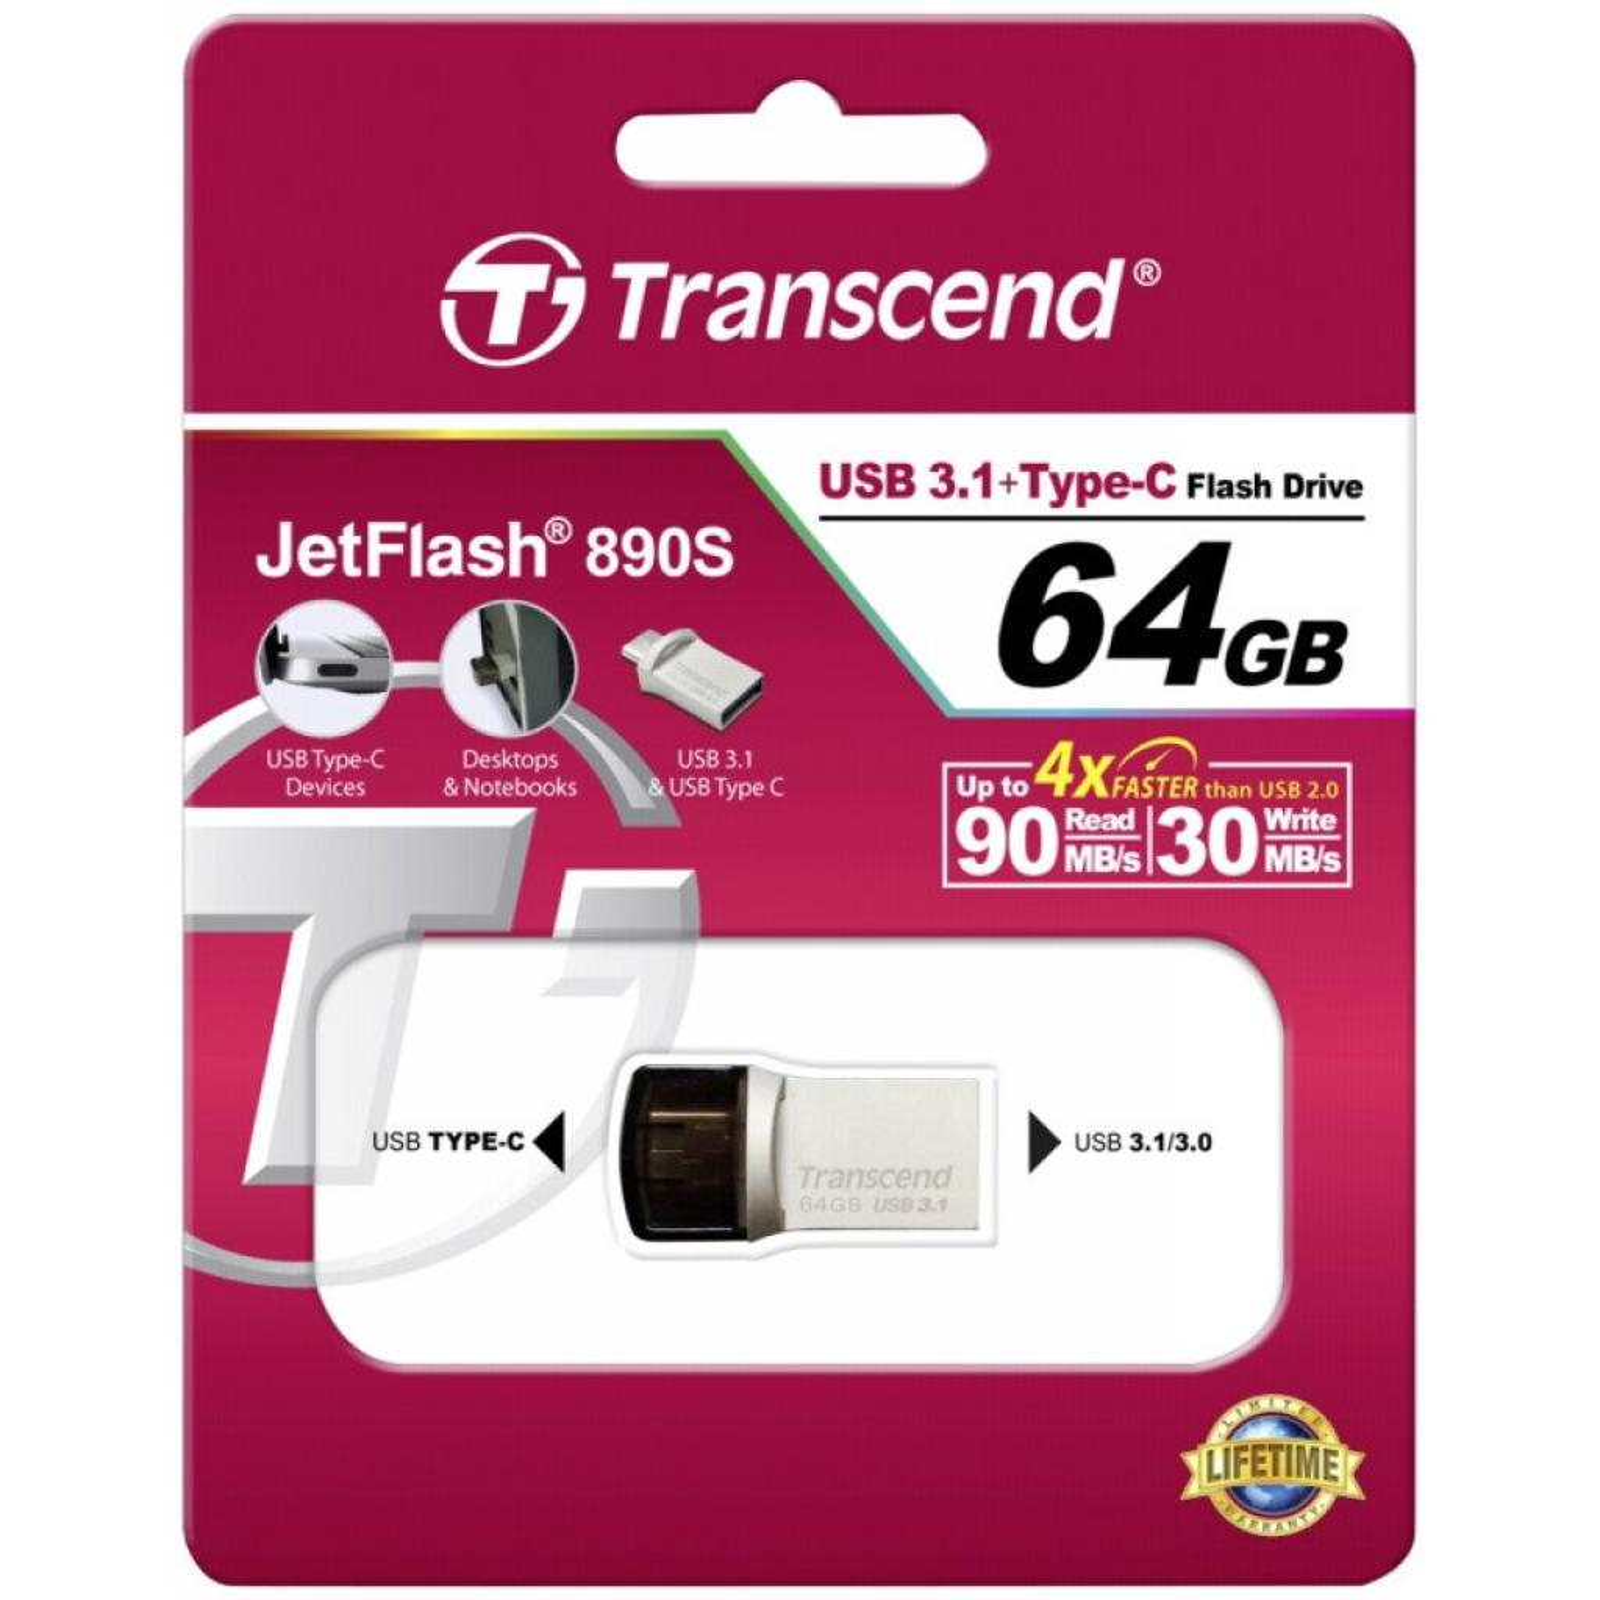 USB флеш накопитель Transcend 64GB JetFlash 890S USB 3.1 (TS64GJF890S) изображение 5